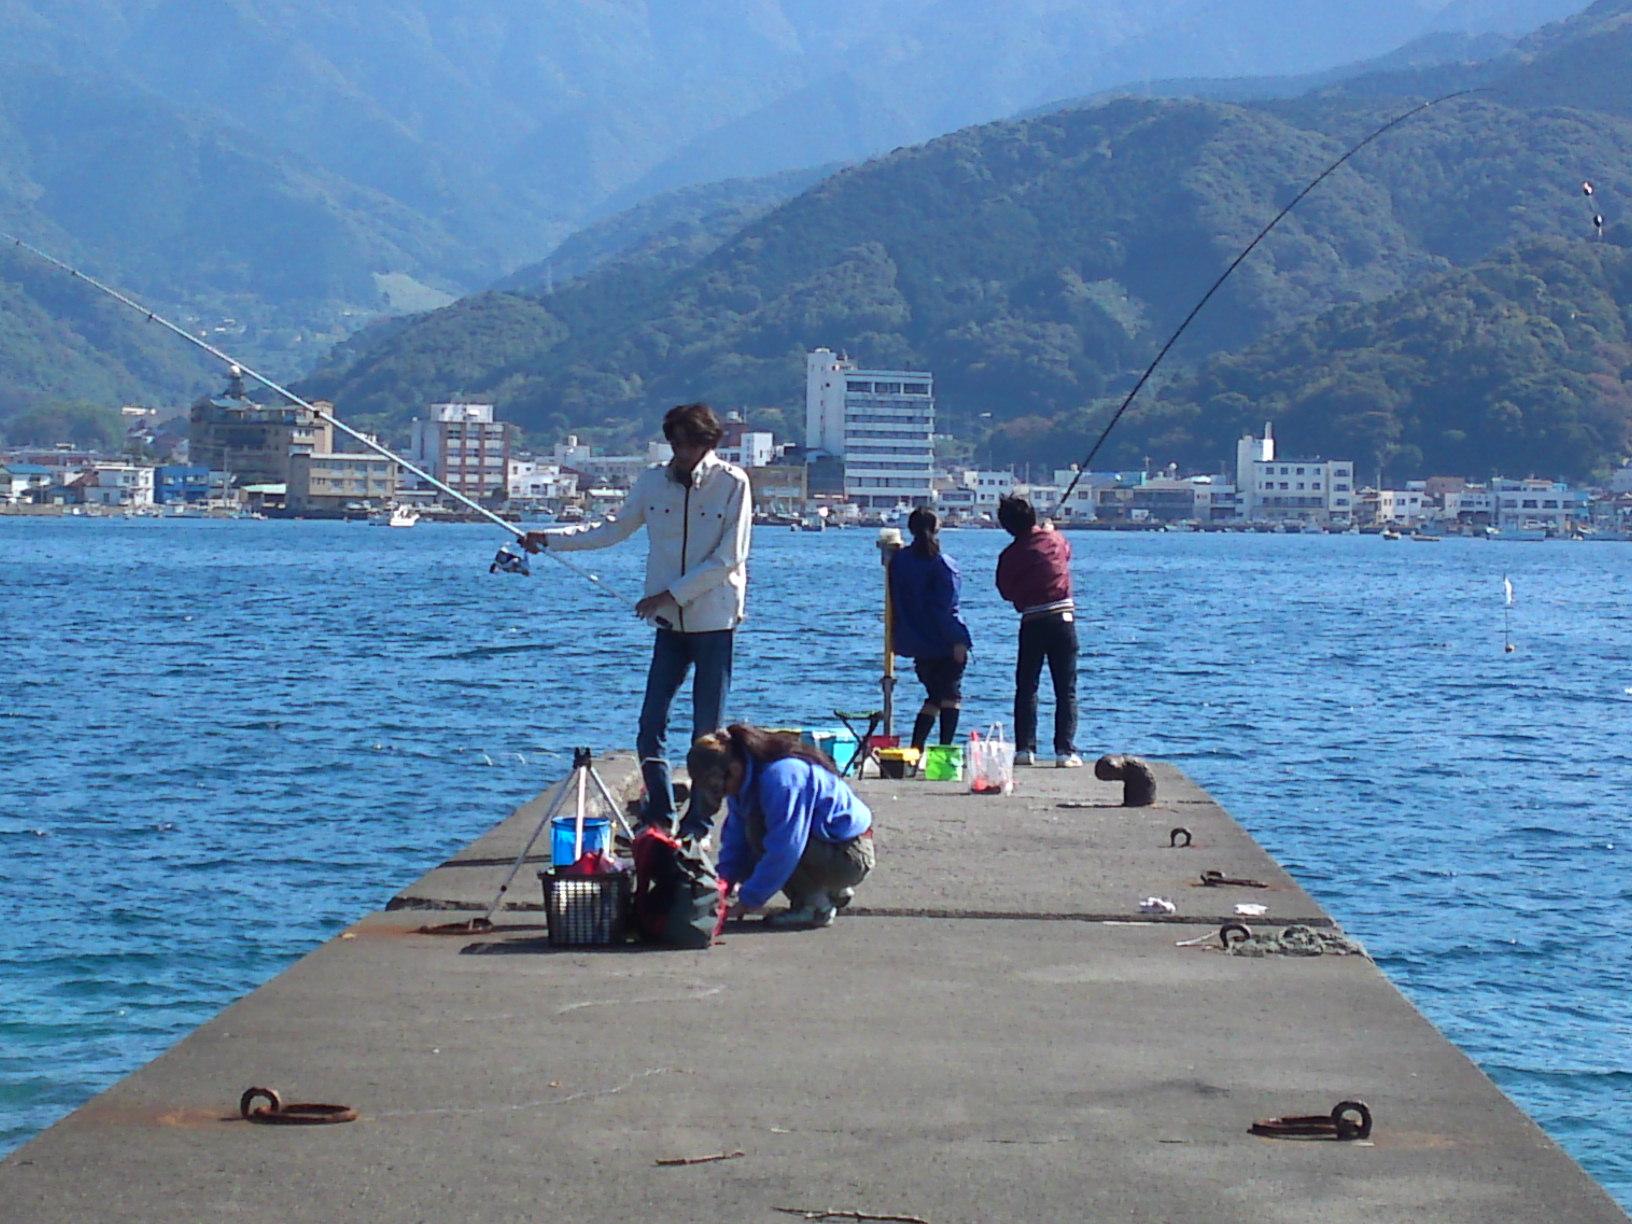 Heda Izu Peninsula Mount Fuji view beach crab museum fishing